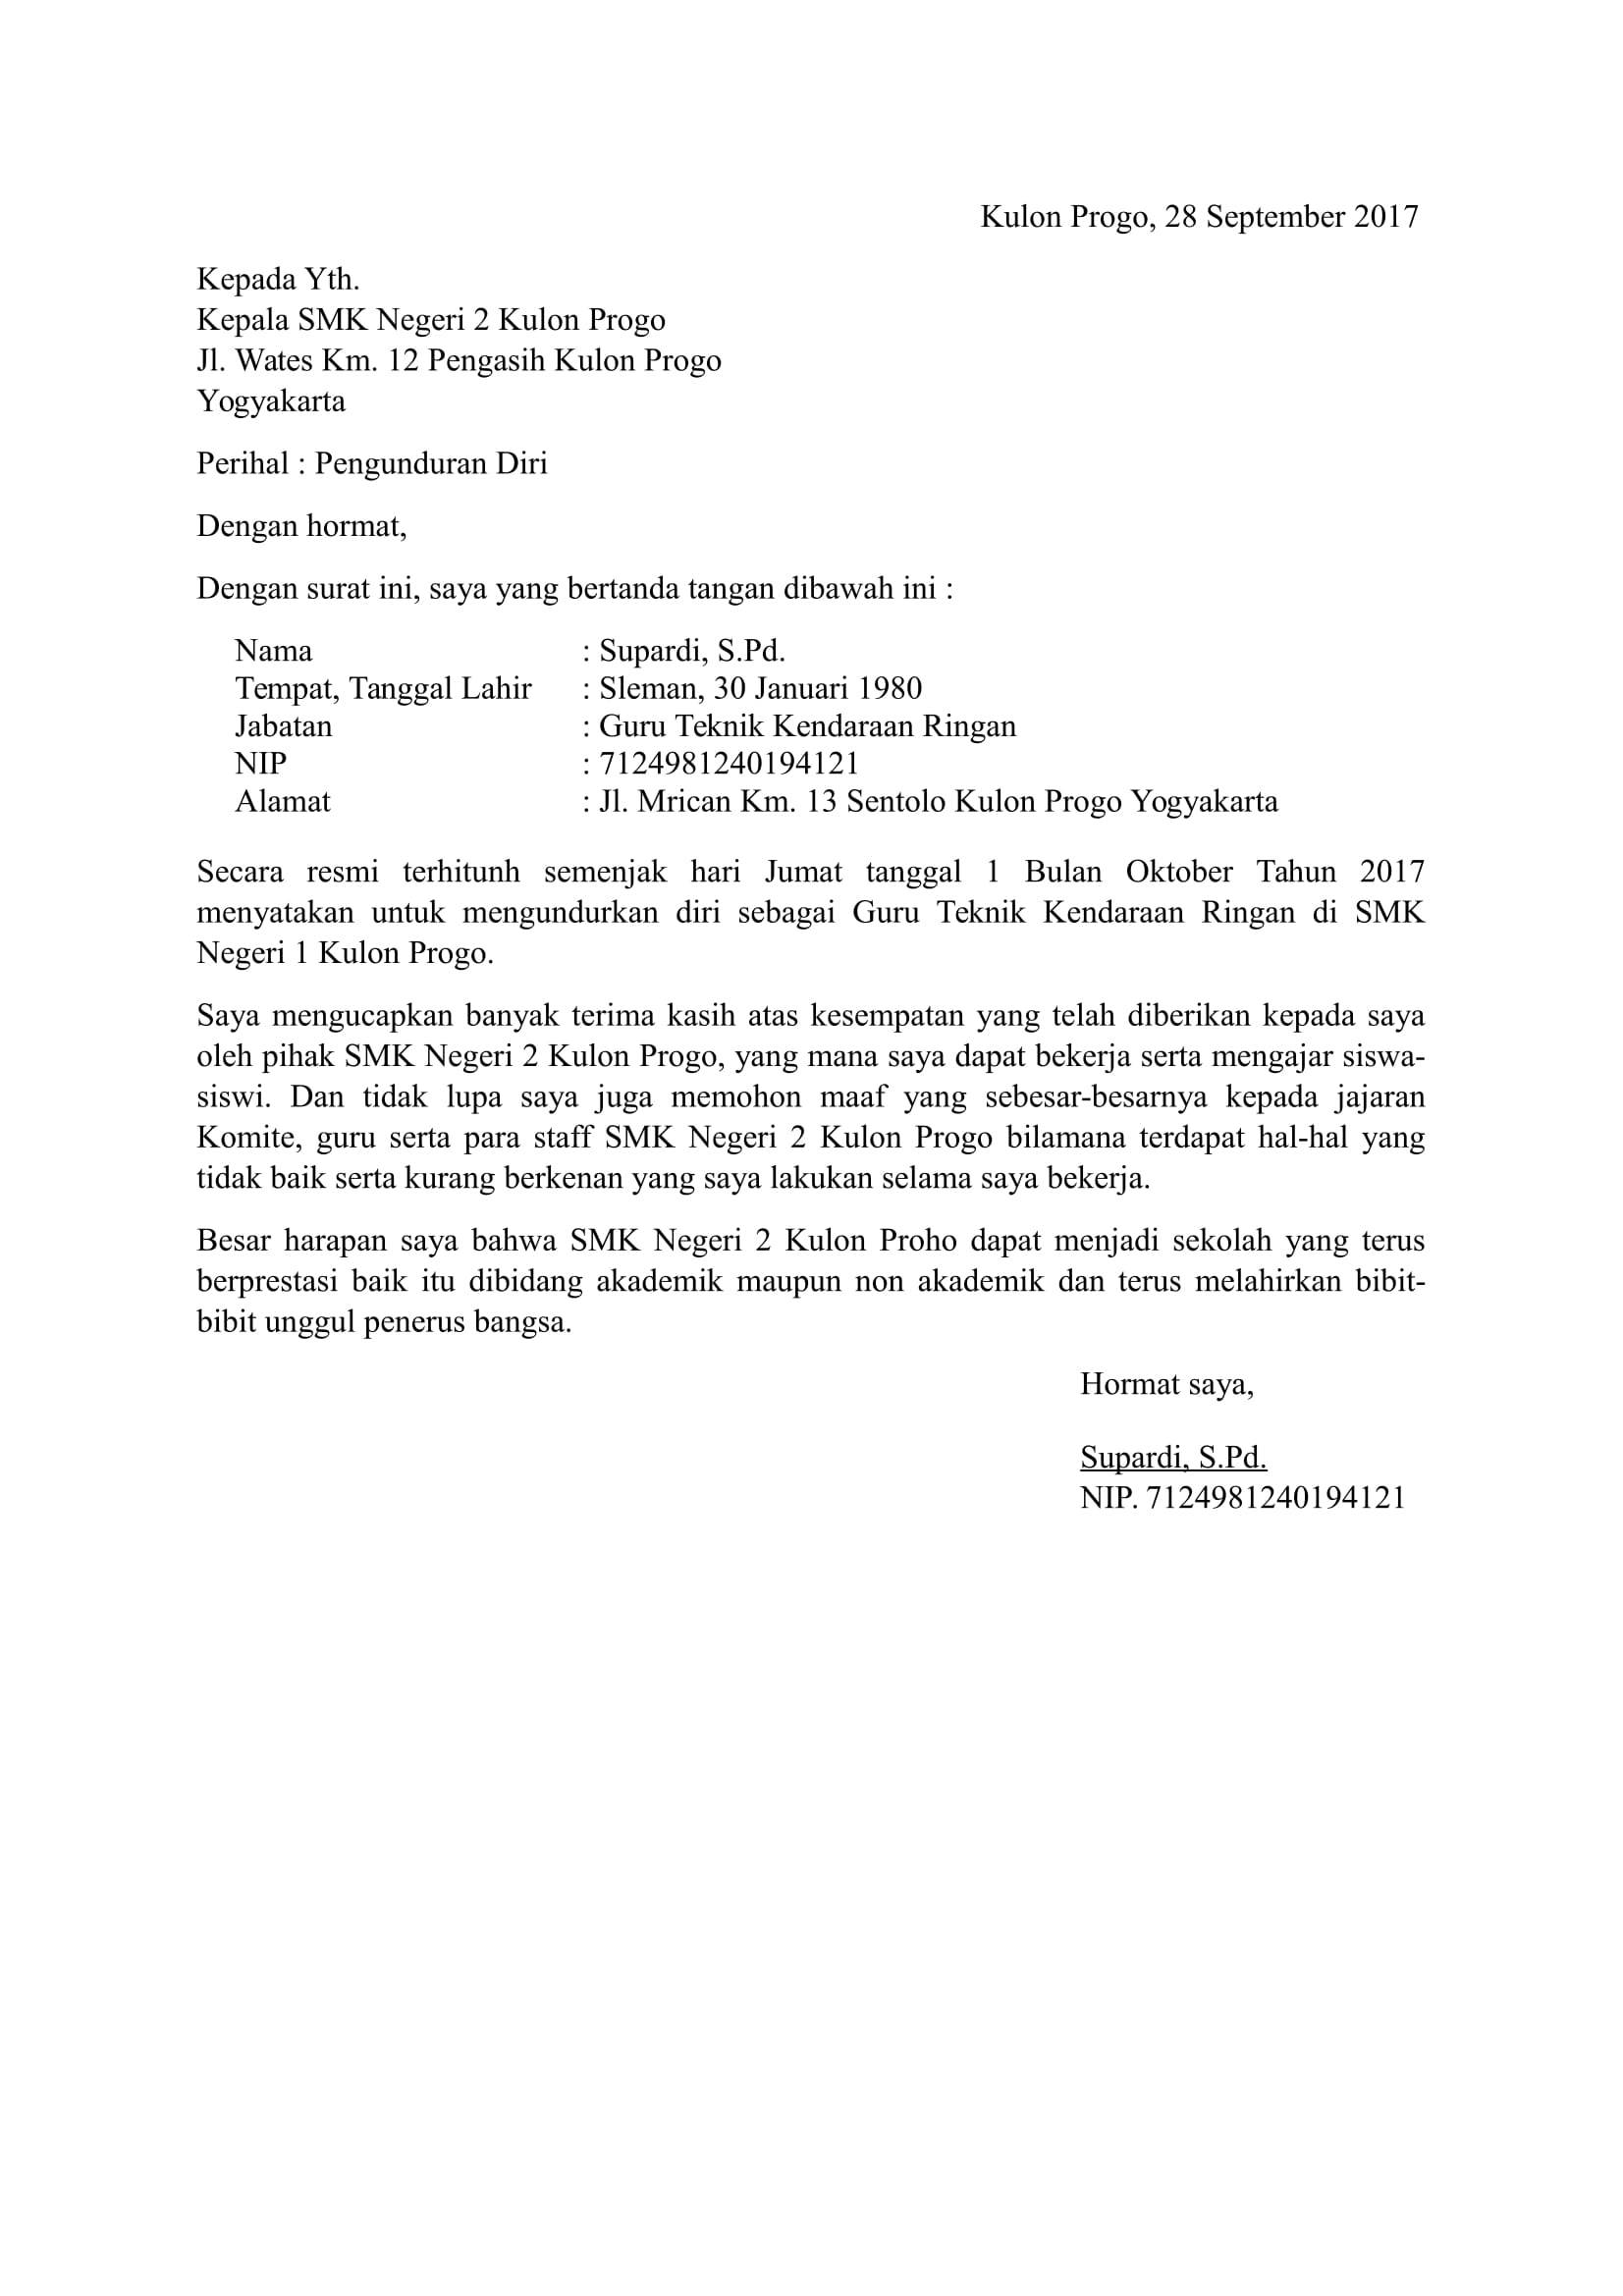 Contoh Surat Balasan Pengunduran Diri Dari Perusahaan ...